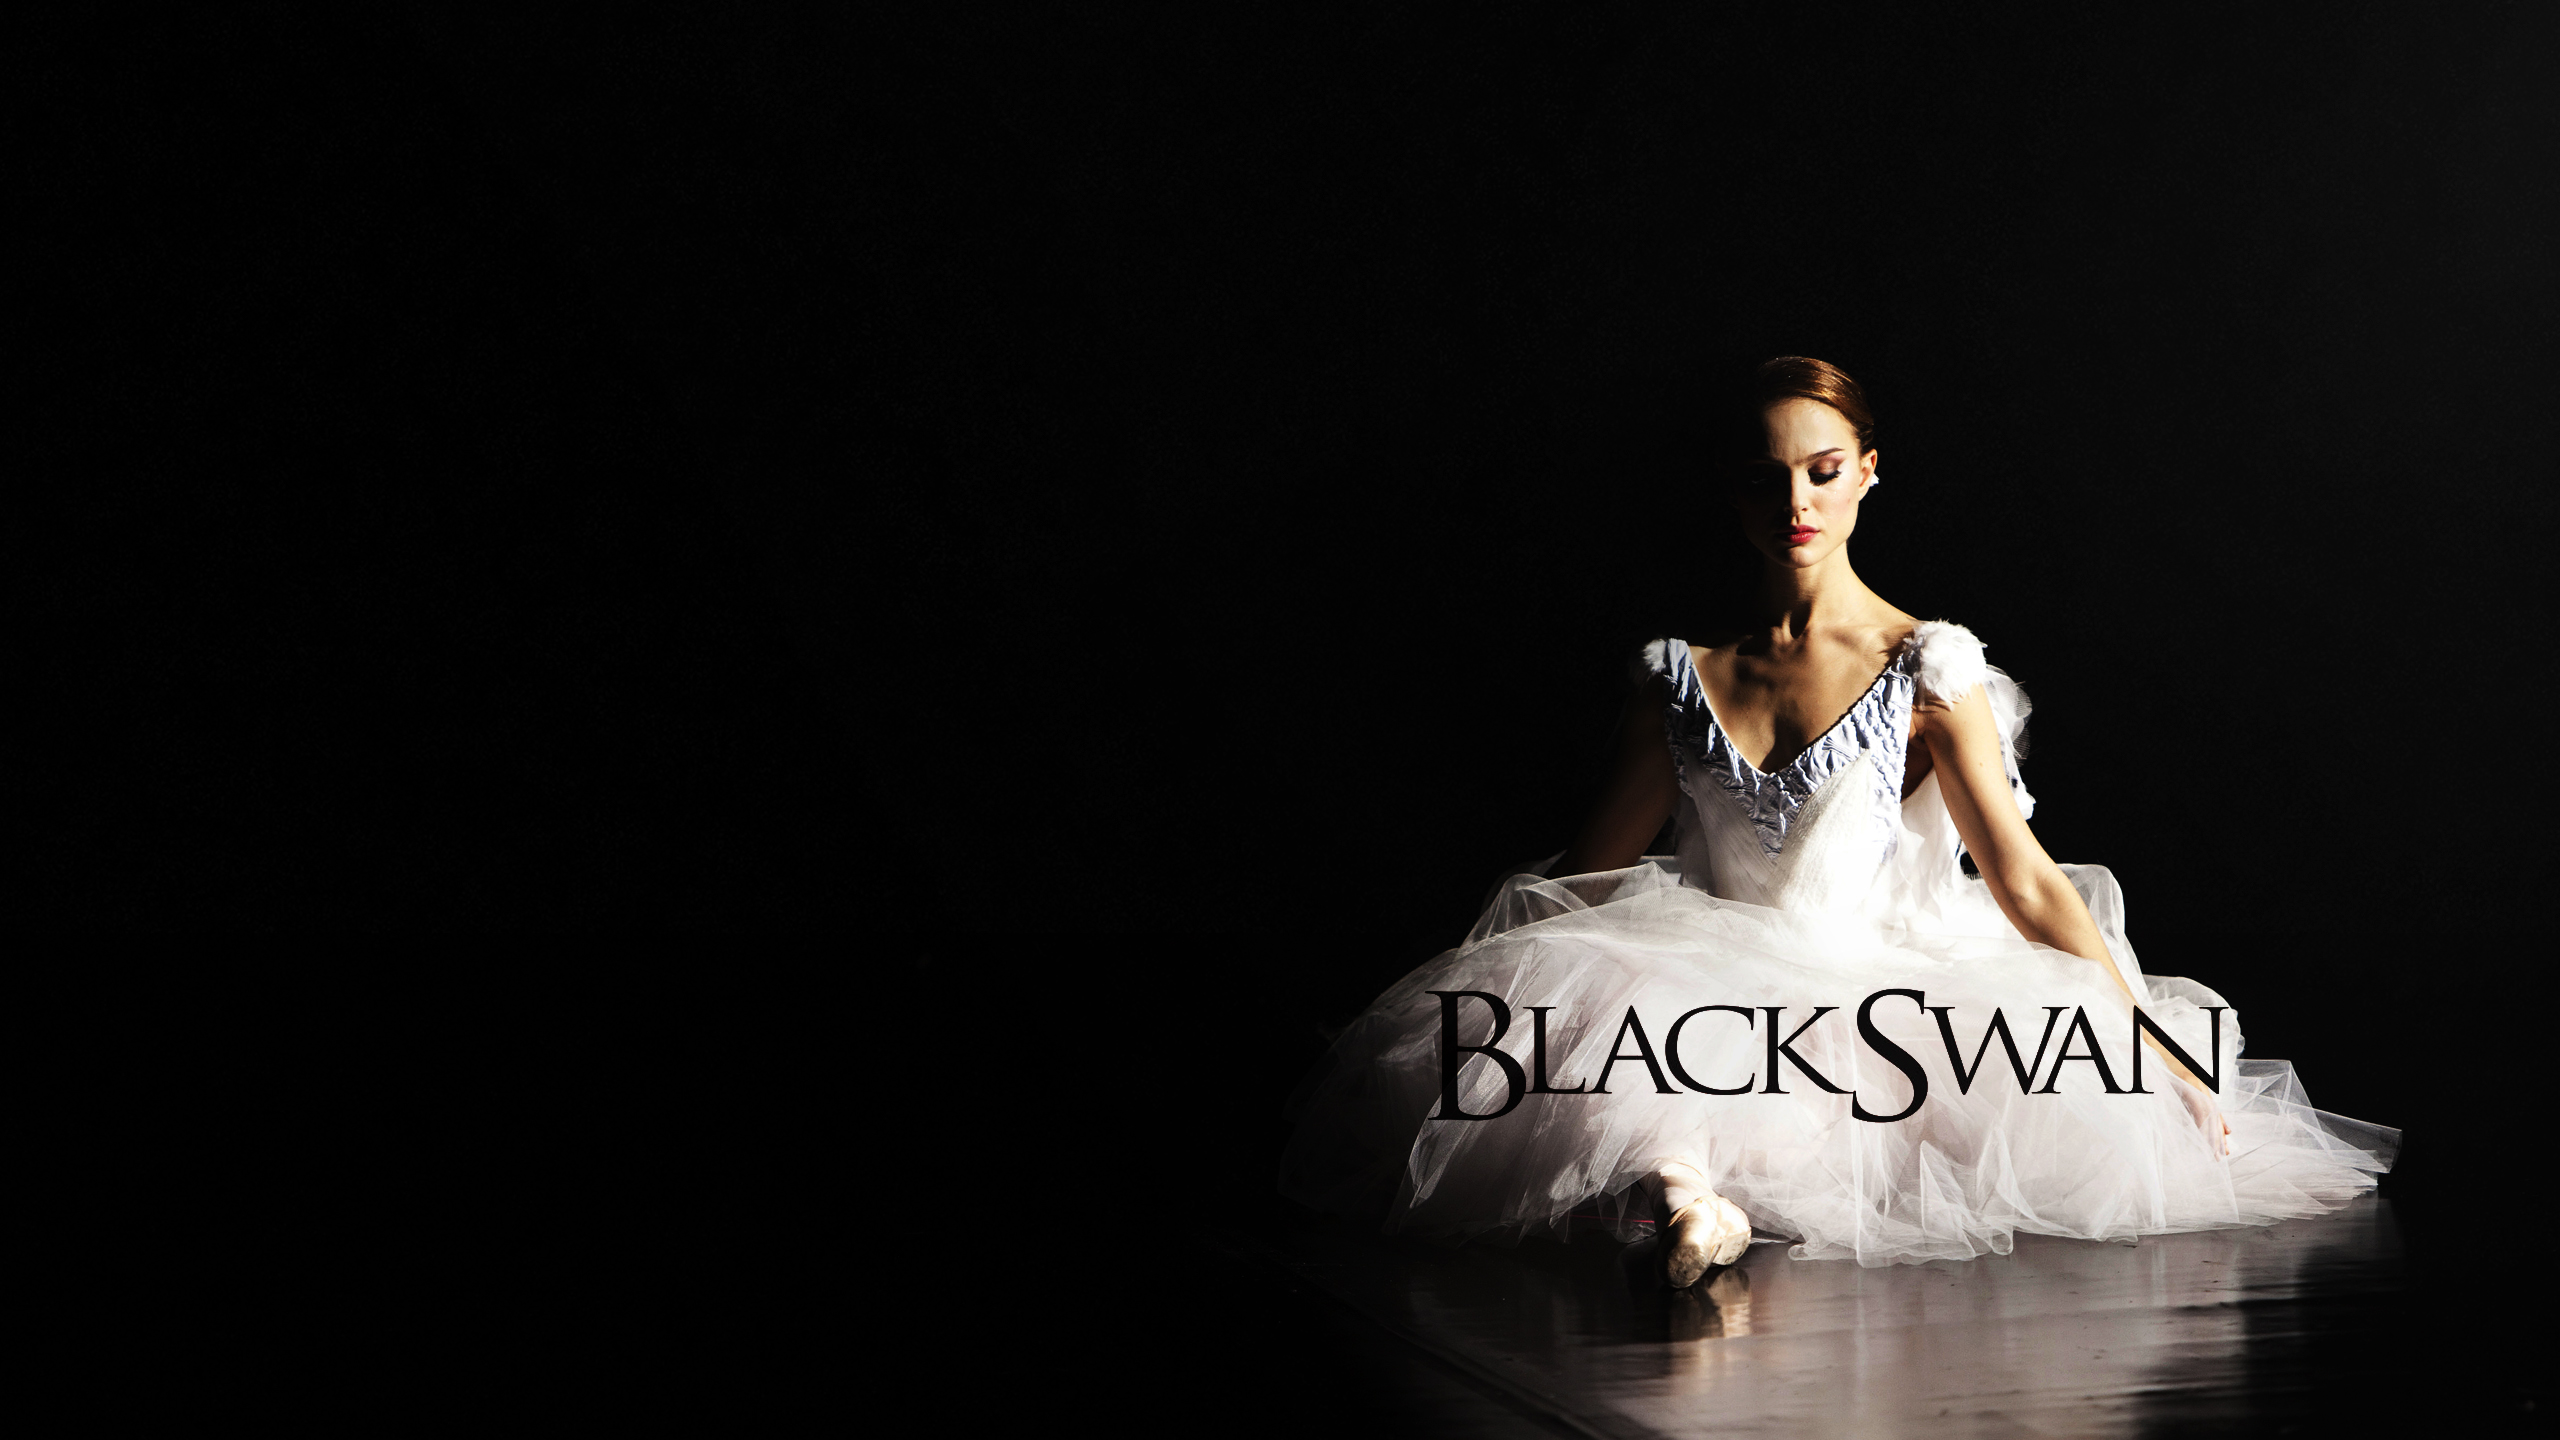 Black Swan   Odette wallpaper by Quick Stop 2560x1440